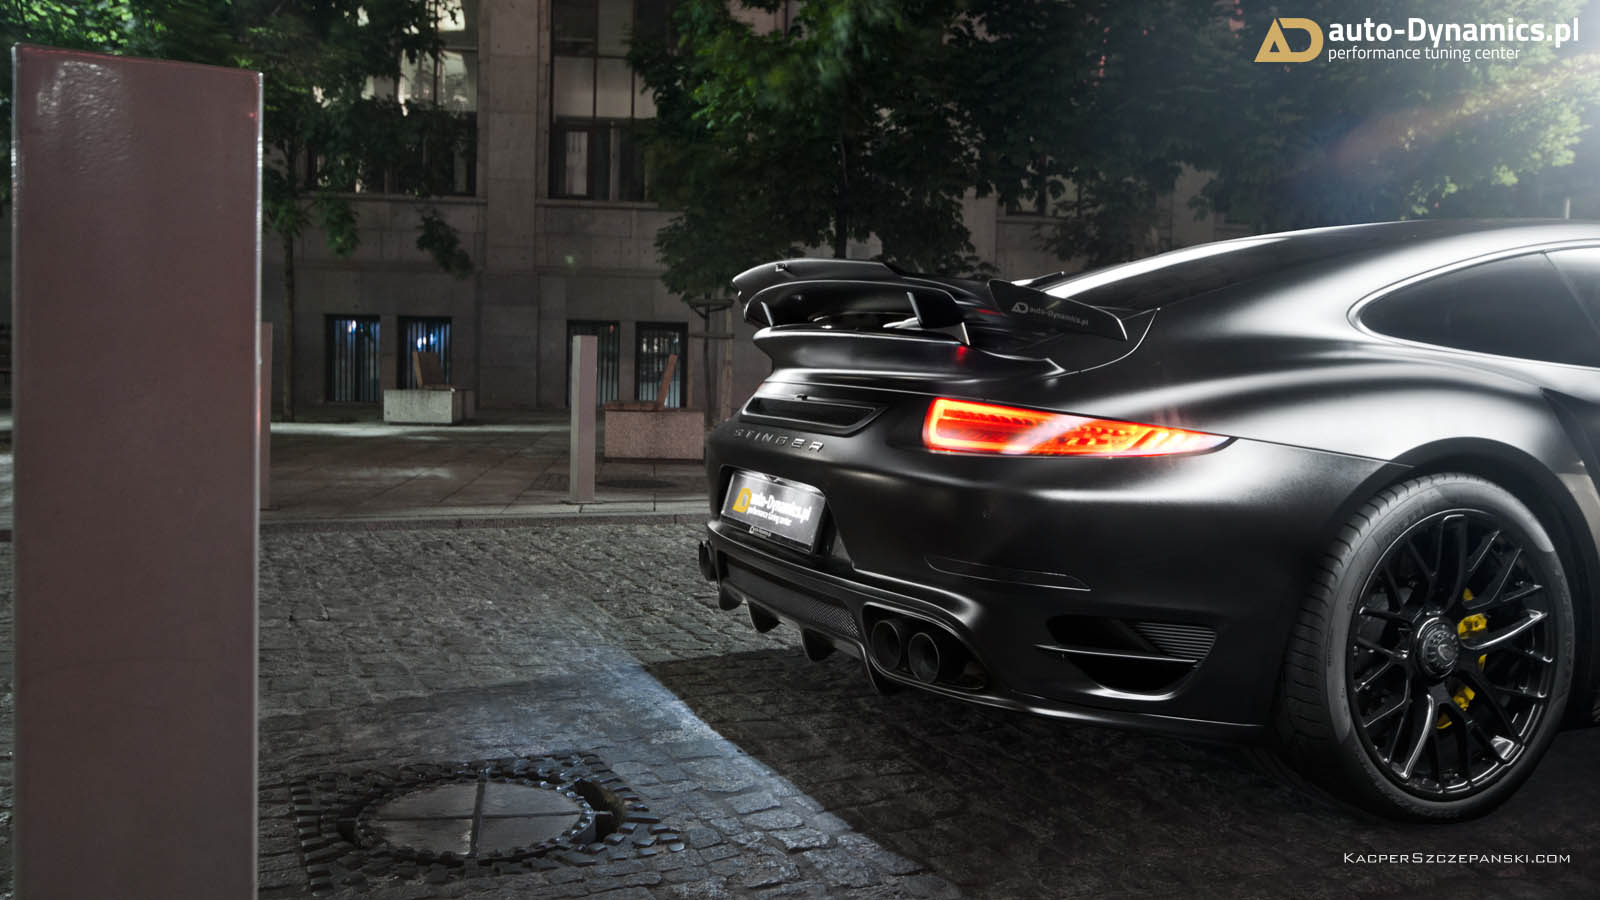 Porsche 911 Turbo S by Auto-Dynamics (13)